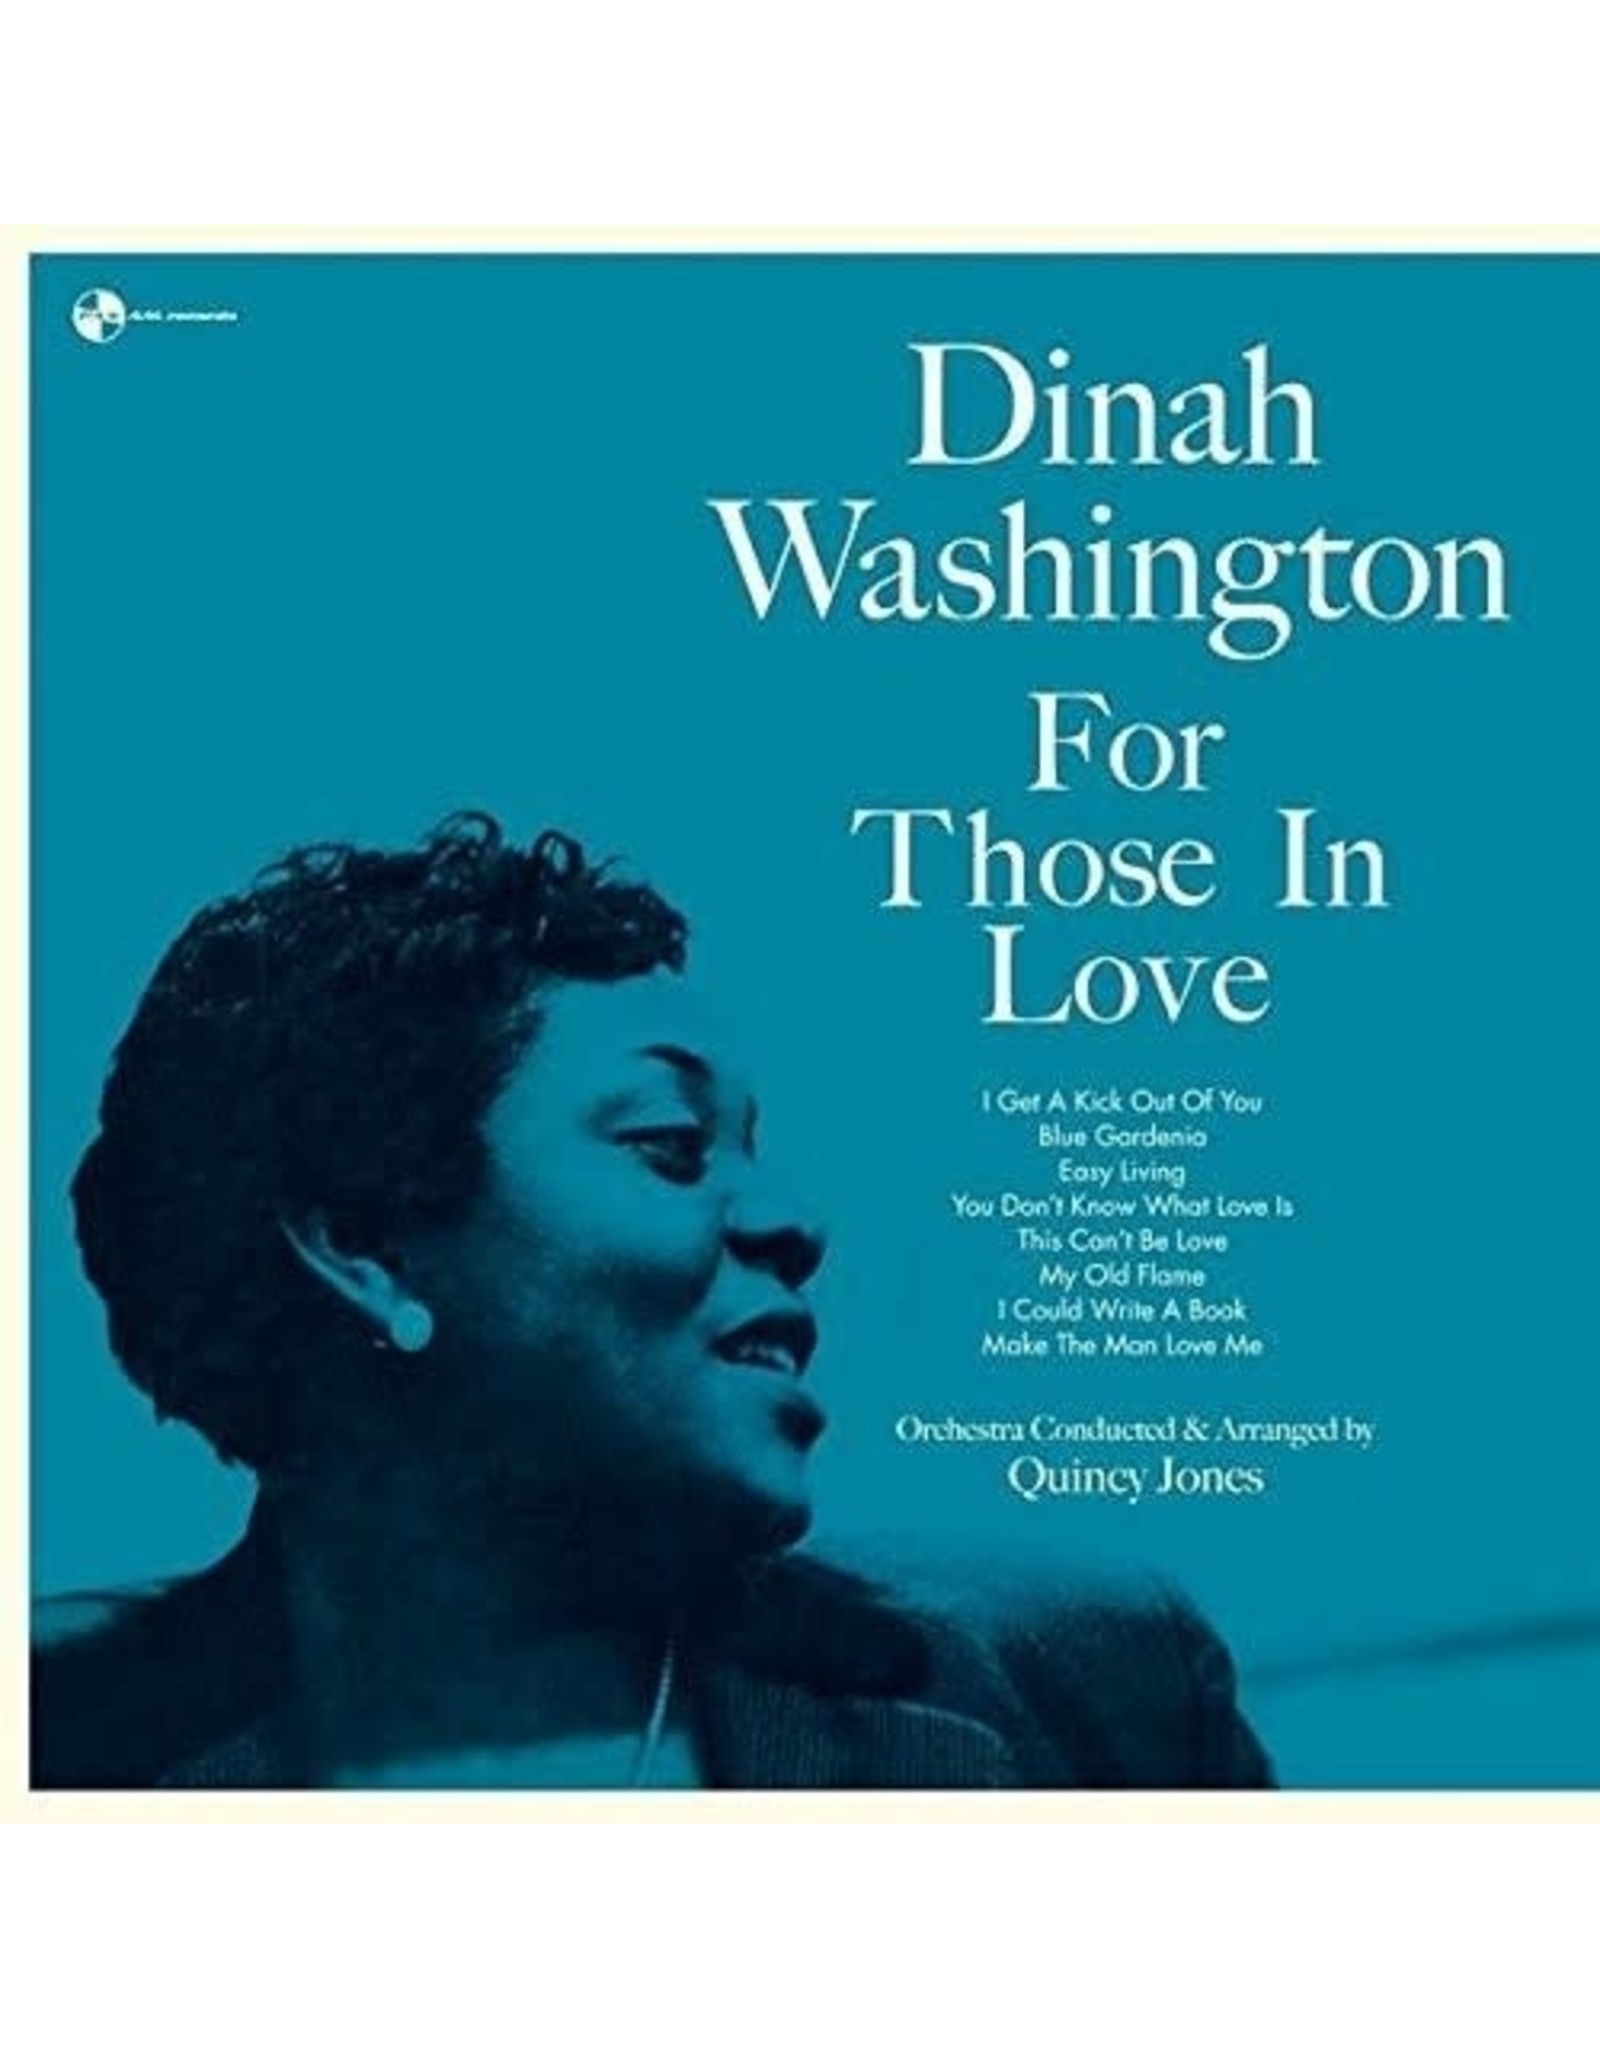 New Vinyl Dinah Washington - For Those In Love LP